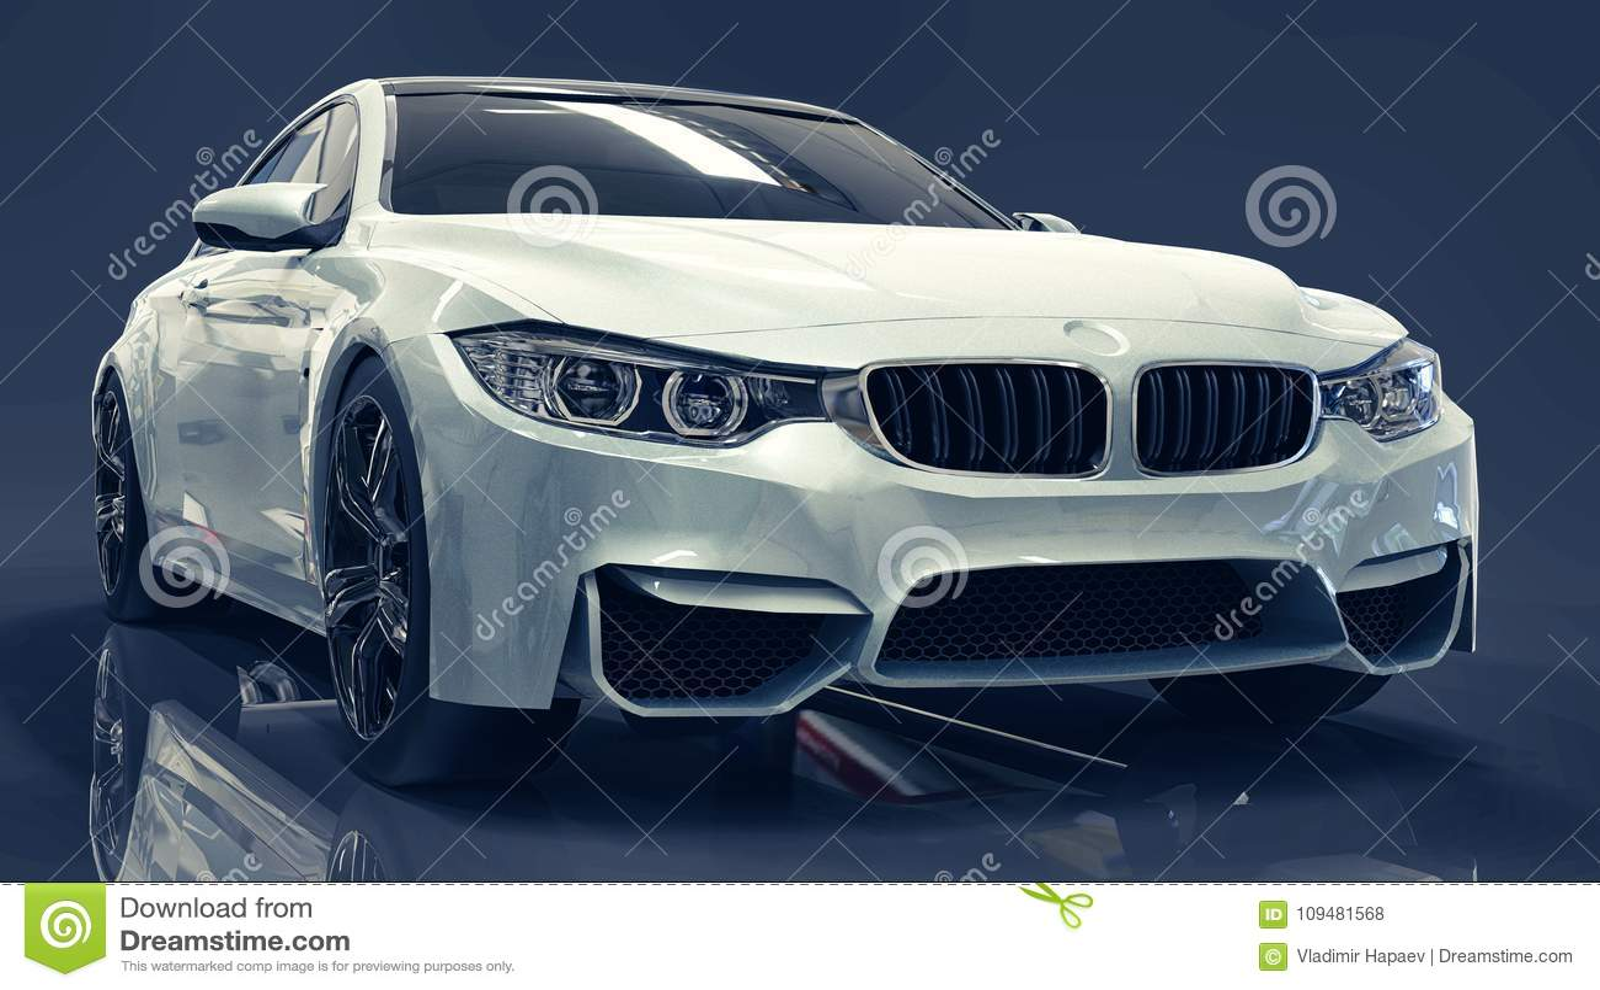 White Premium Bmw Car Three Dimensional Illustration On A Dark Blue